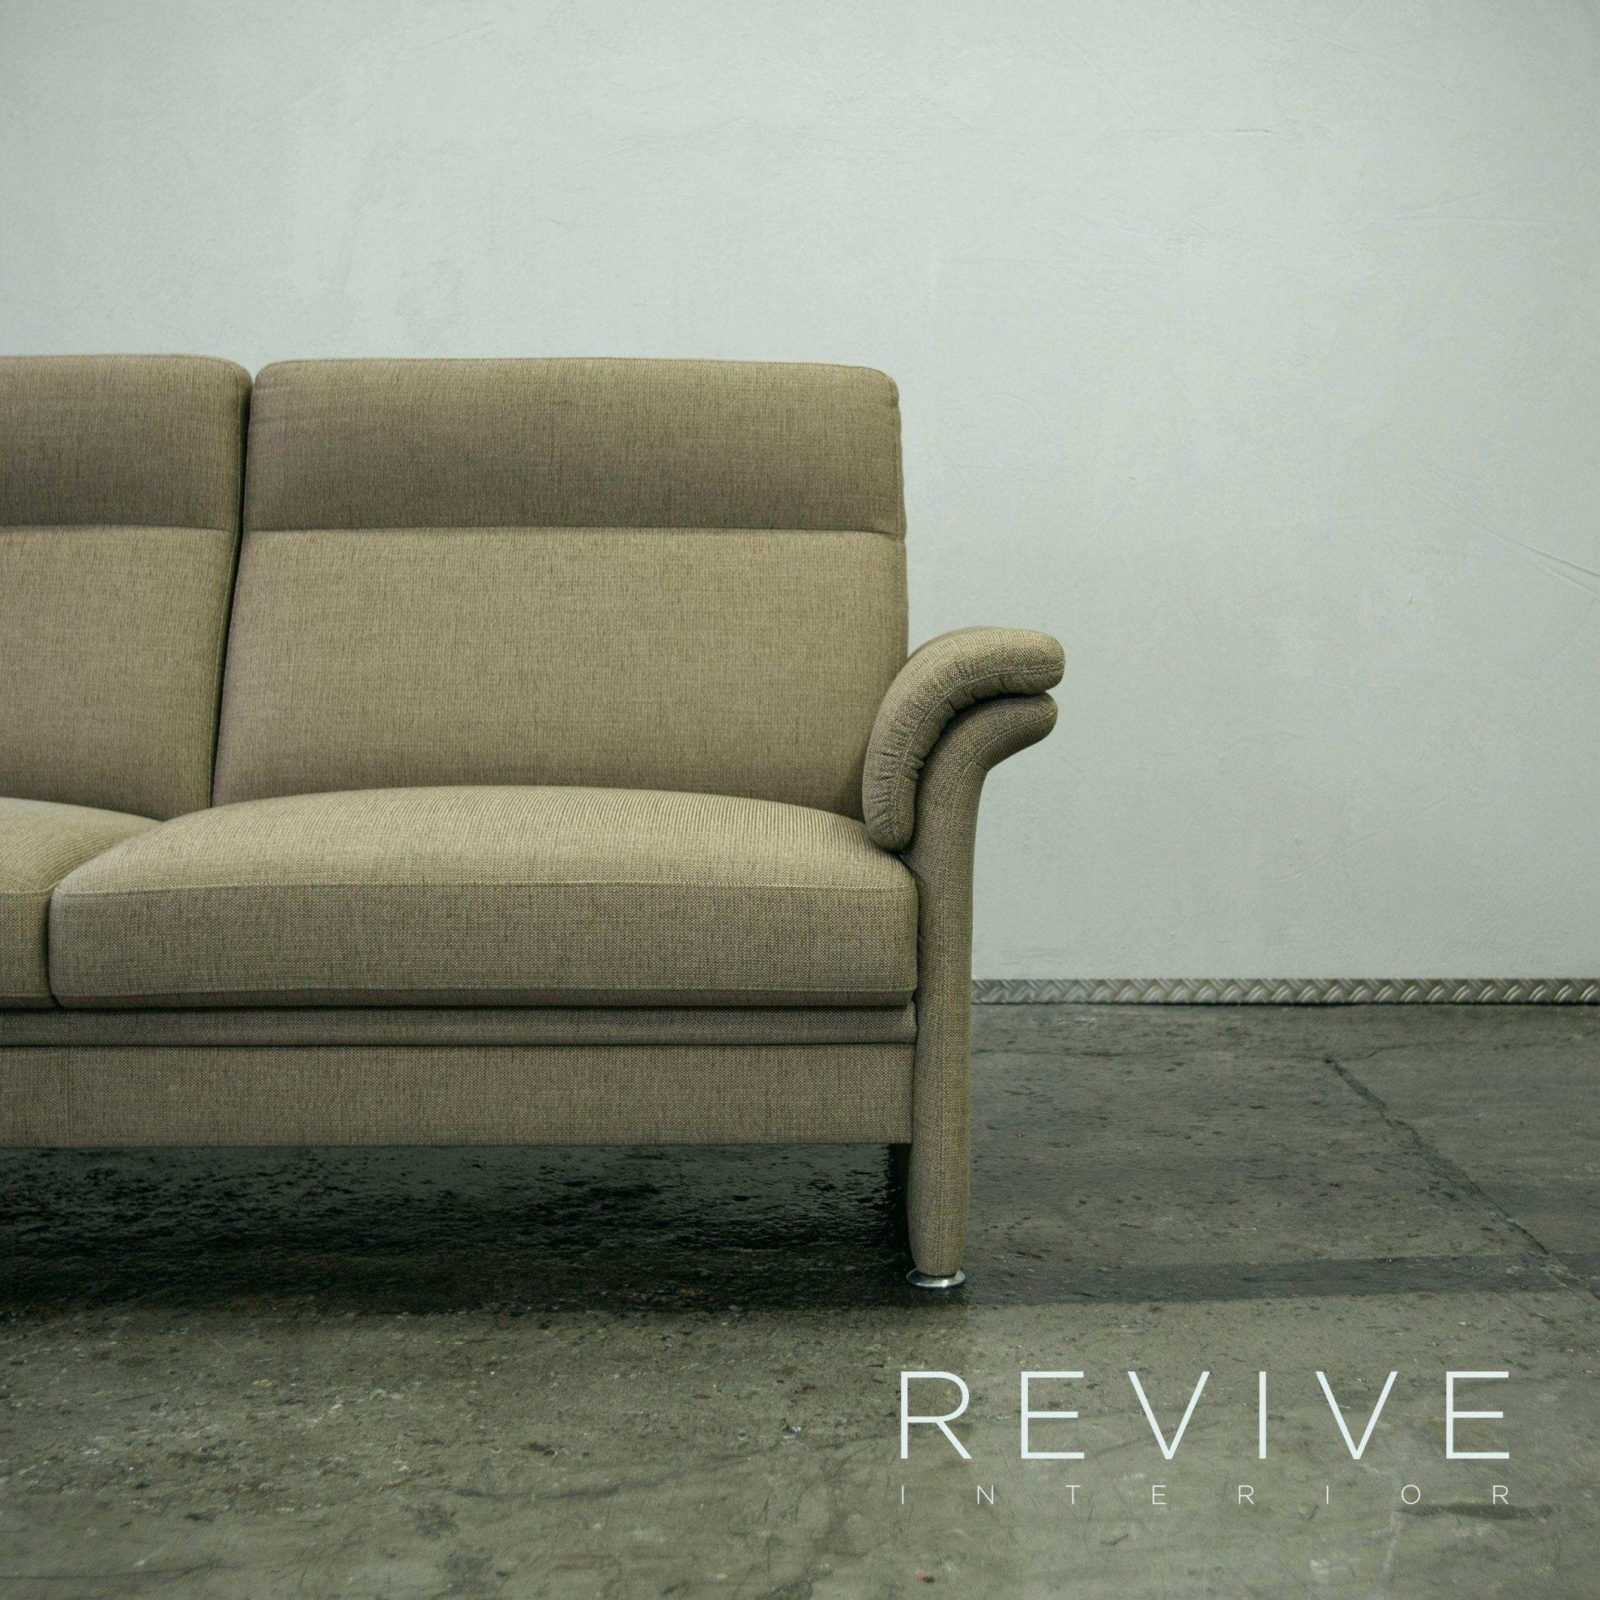 sofa flecken entfernen best fliesen reinigen tipps. Black Bedroom Furniture Sets. Home Design Ideas